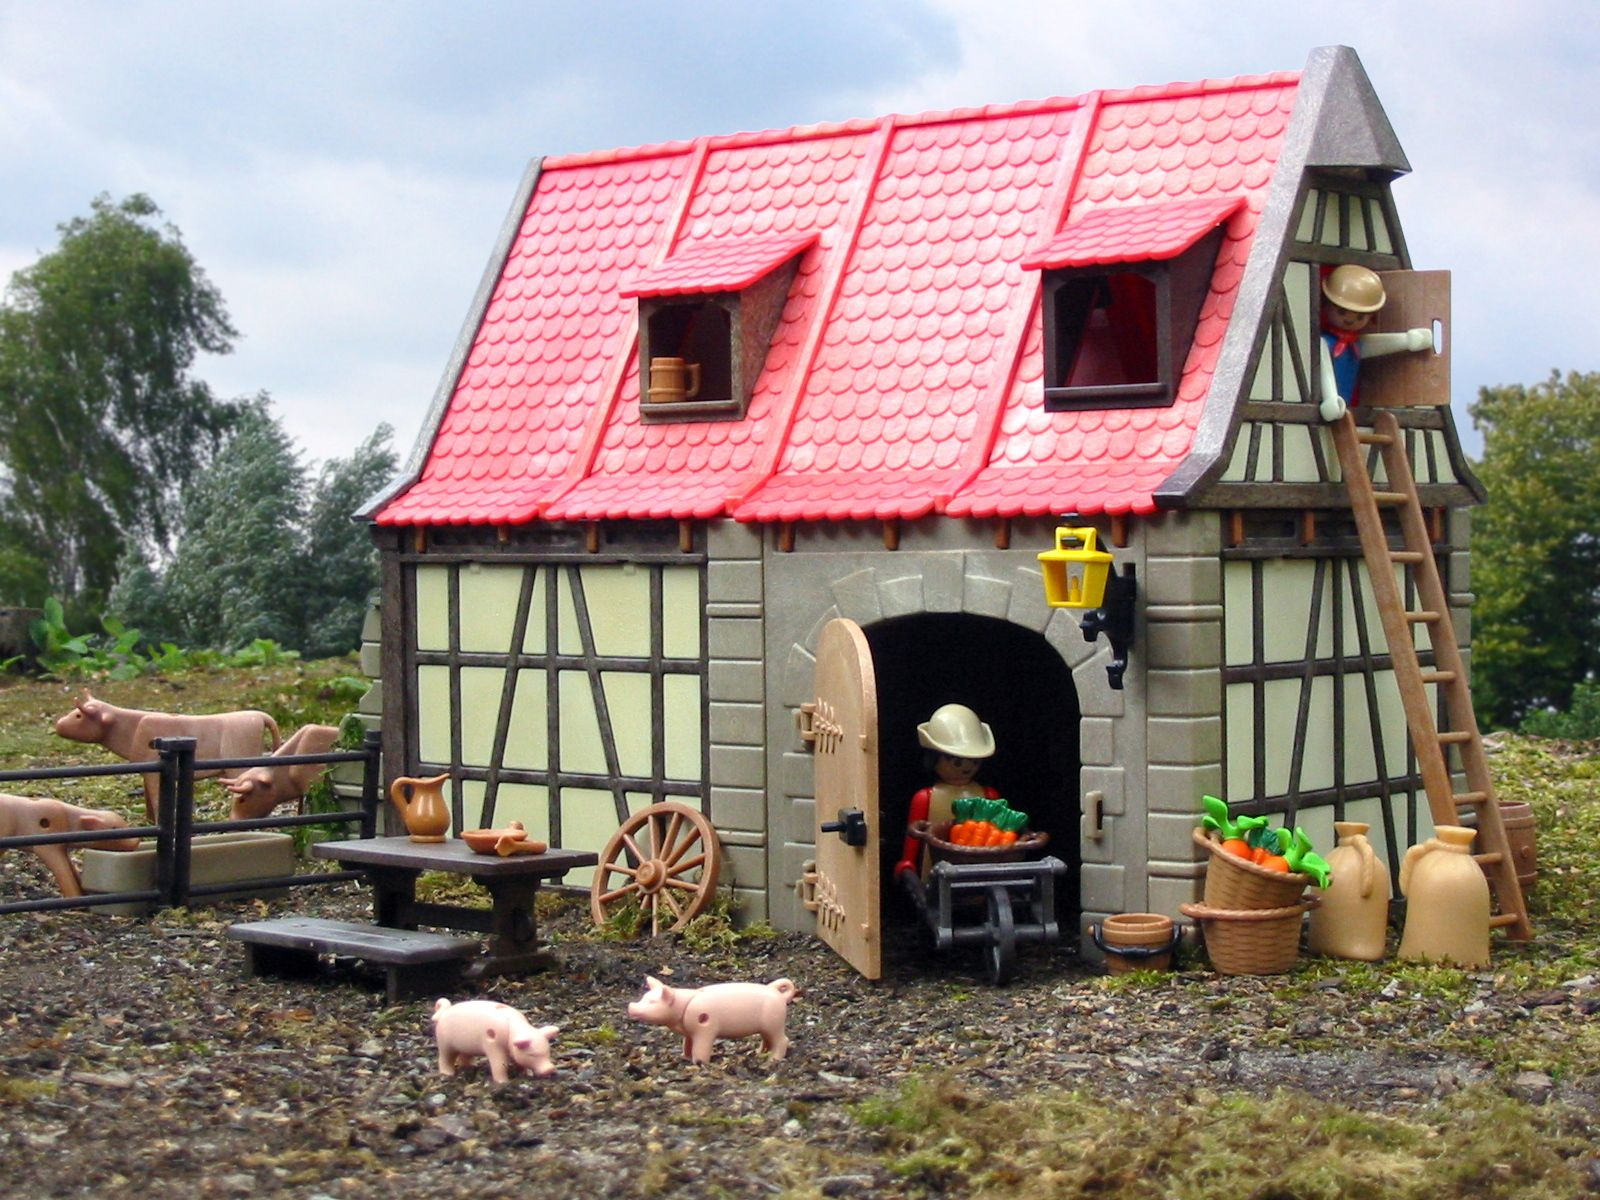 Playmobil farm house | ☆ Playmobil ➀ ☆ | Pinterest | Playmobil ... for Playmobil Farmhouse 173lyp